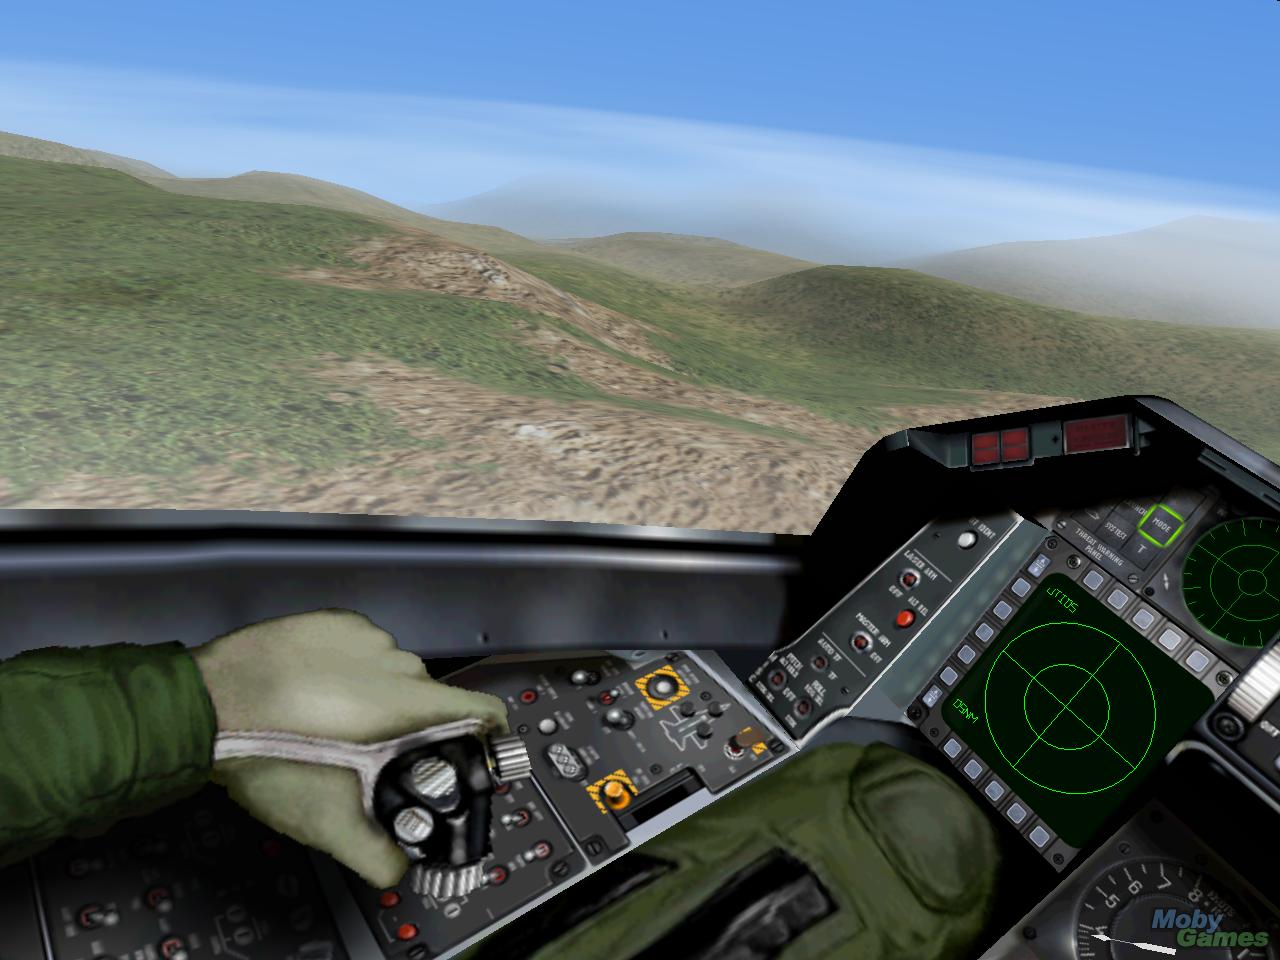 F-16 Aero PC Fighting Game